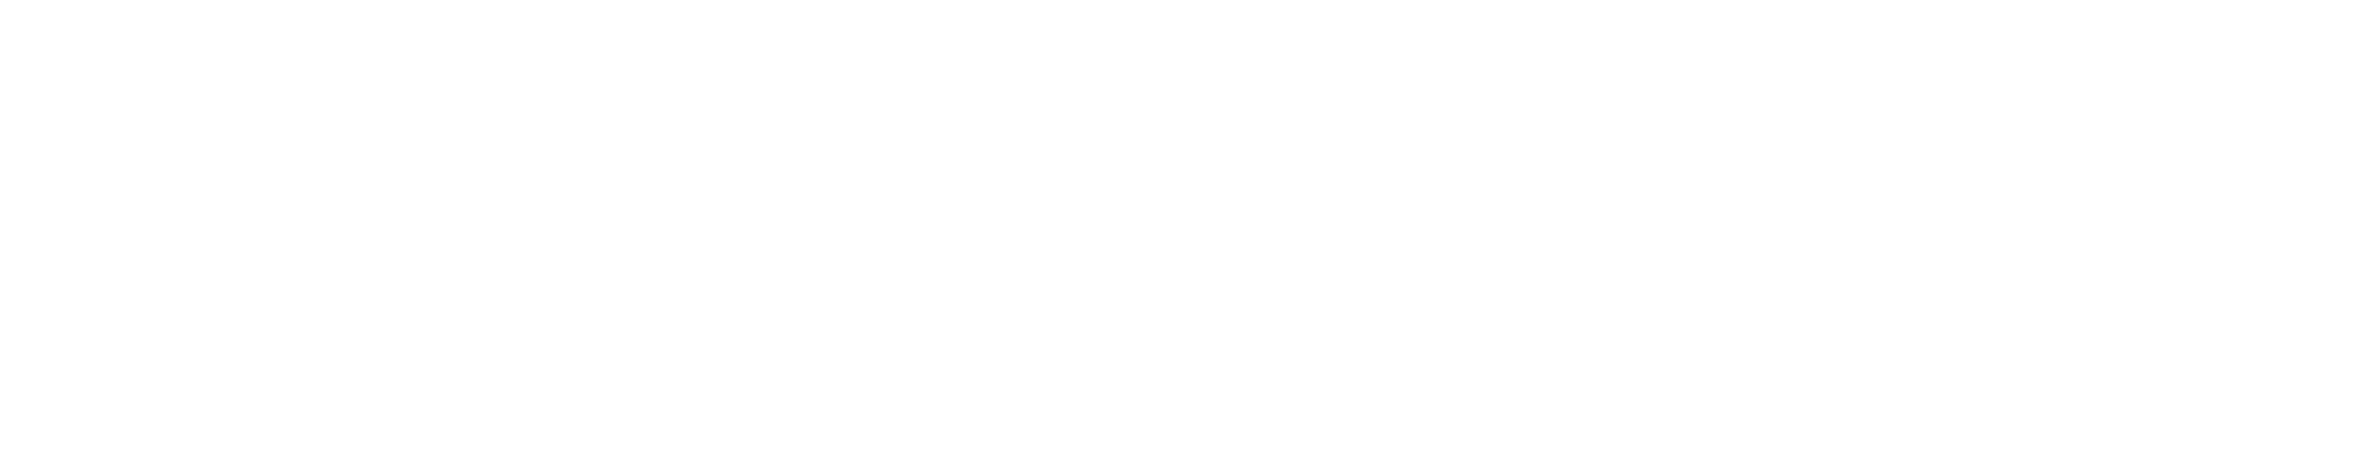 Tan_Republic_logo_formal_White_Transparent.png